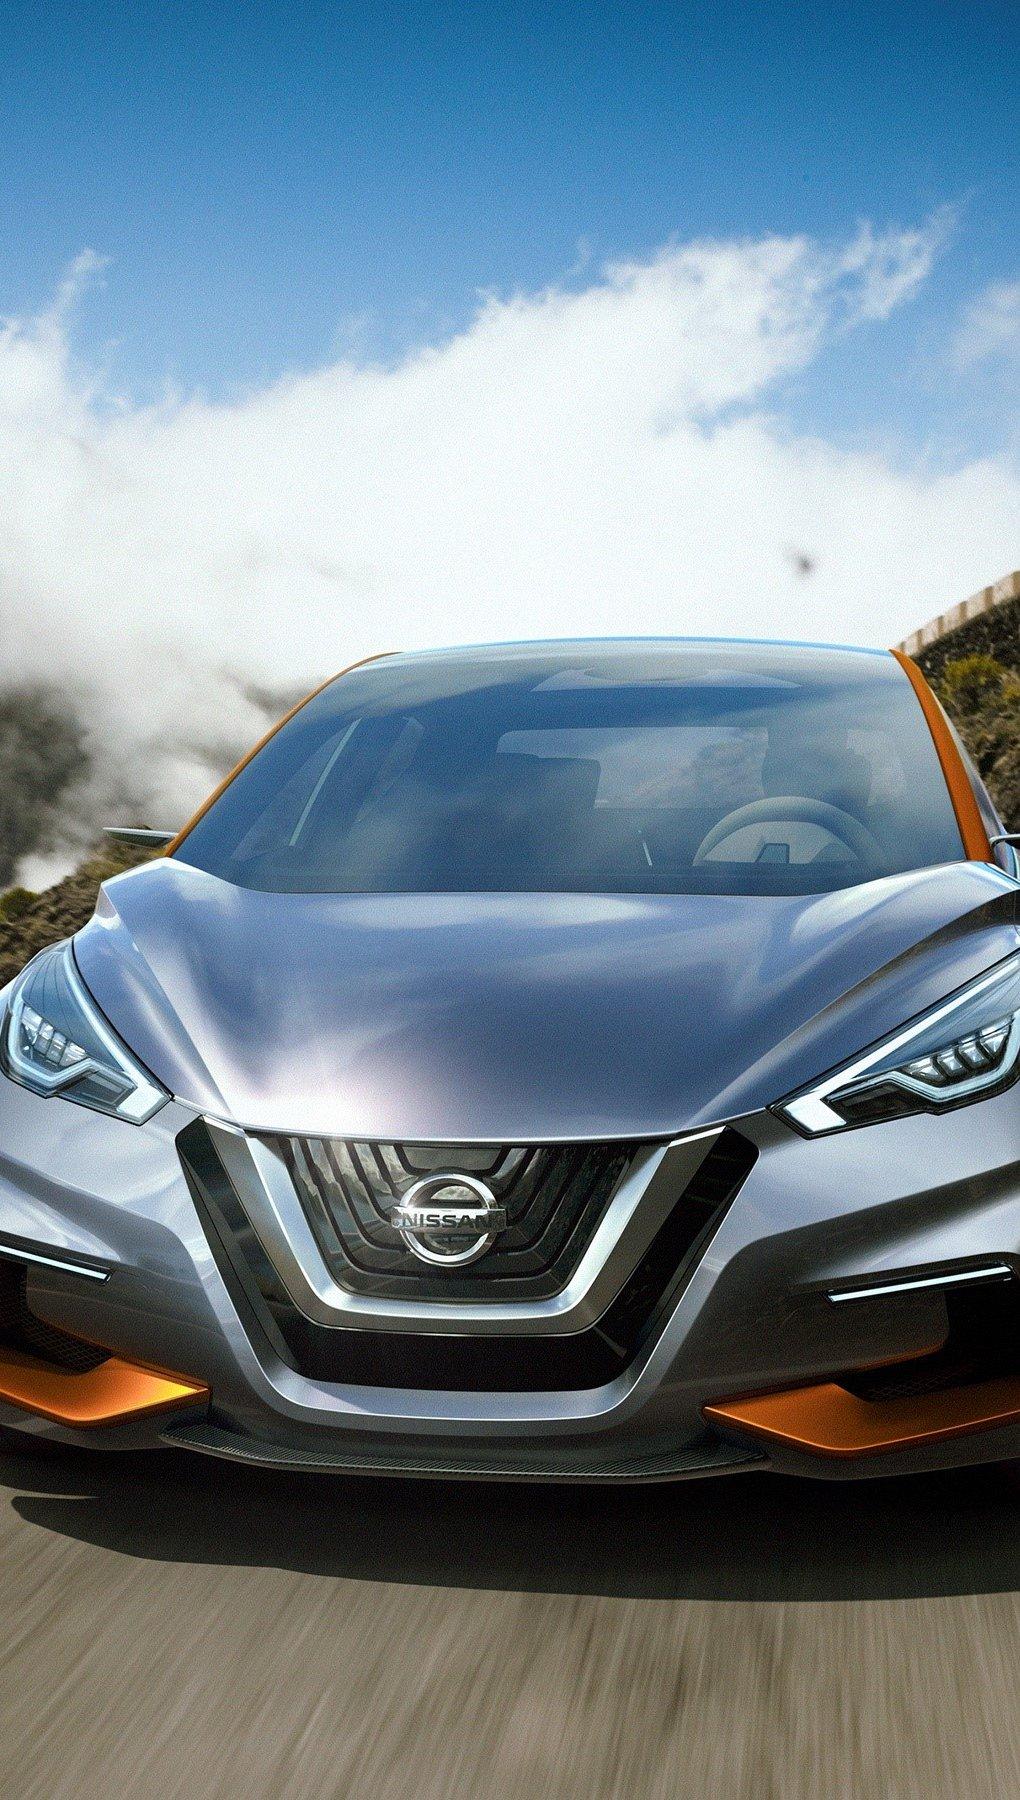 Fondos de pantalla Nissan Sway Concept Vertical